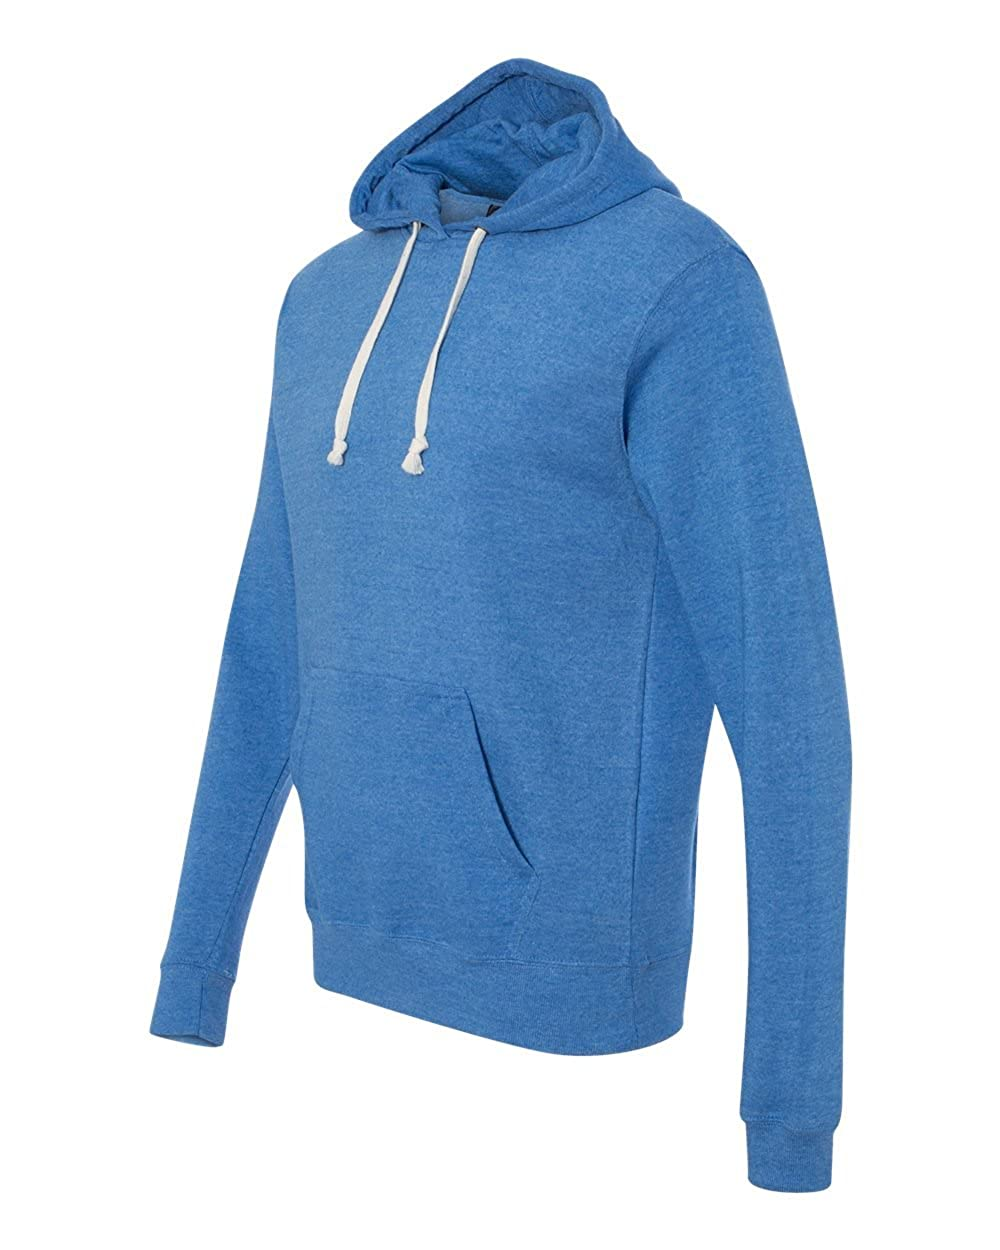 America Triblend Pullover Fleece Hood J